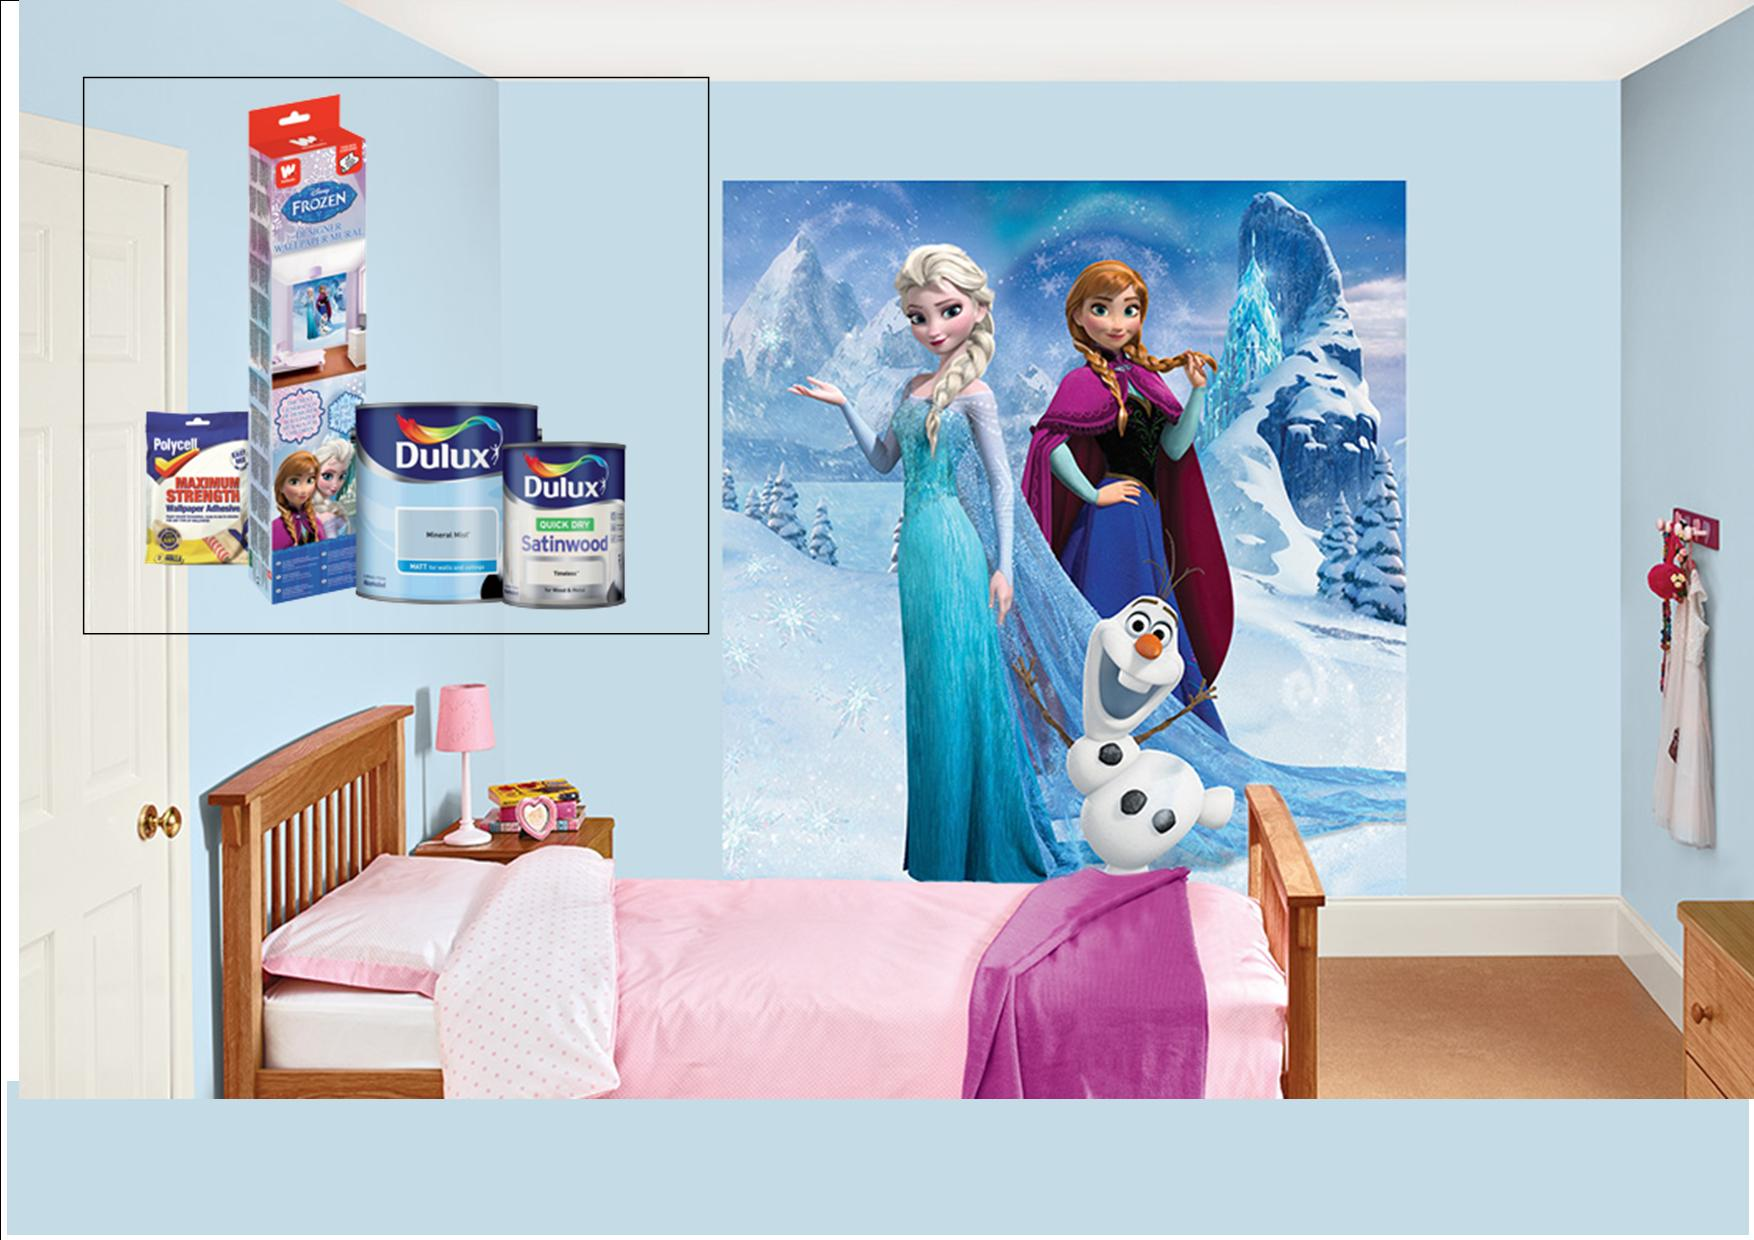 Dulux Avengers Bedroom In A Box: Dulux Wallpaper Canada